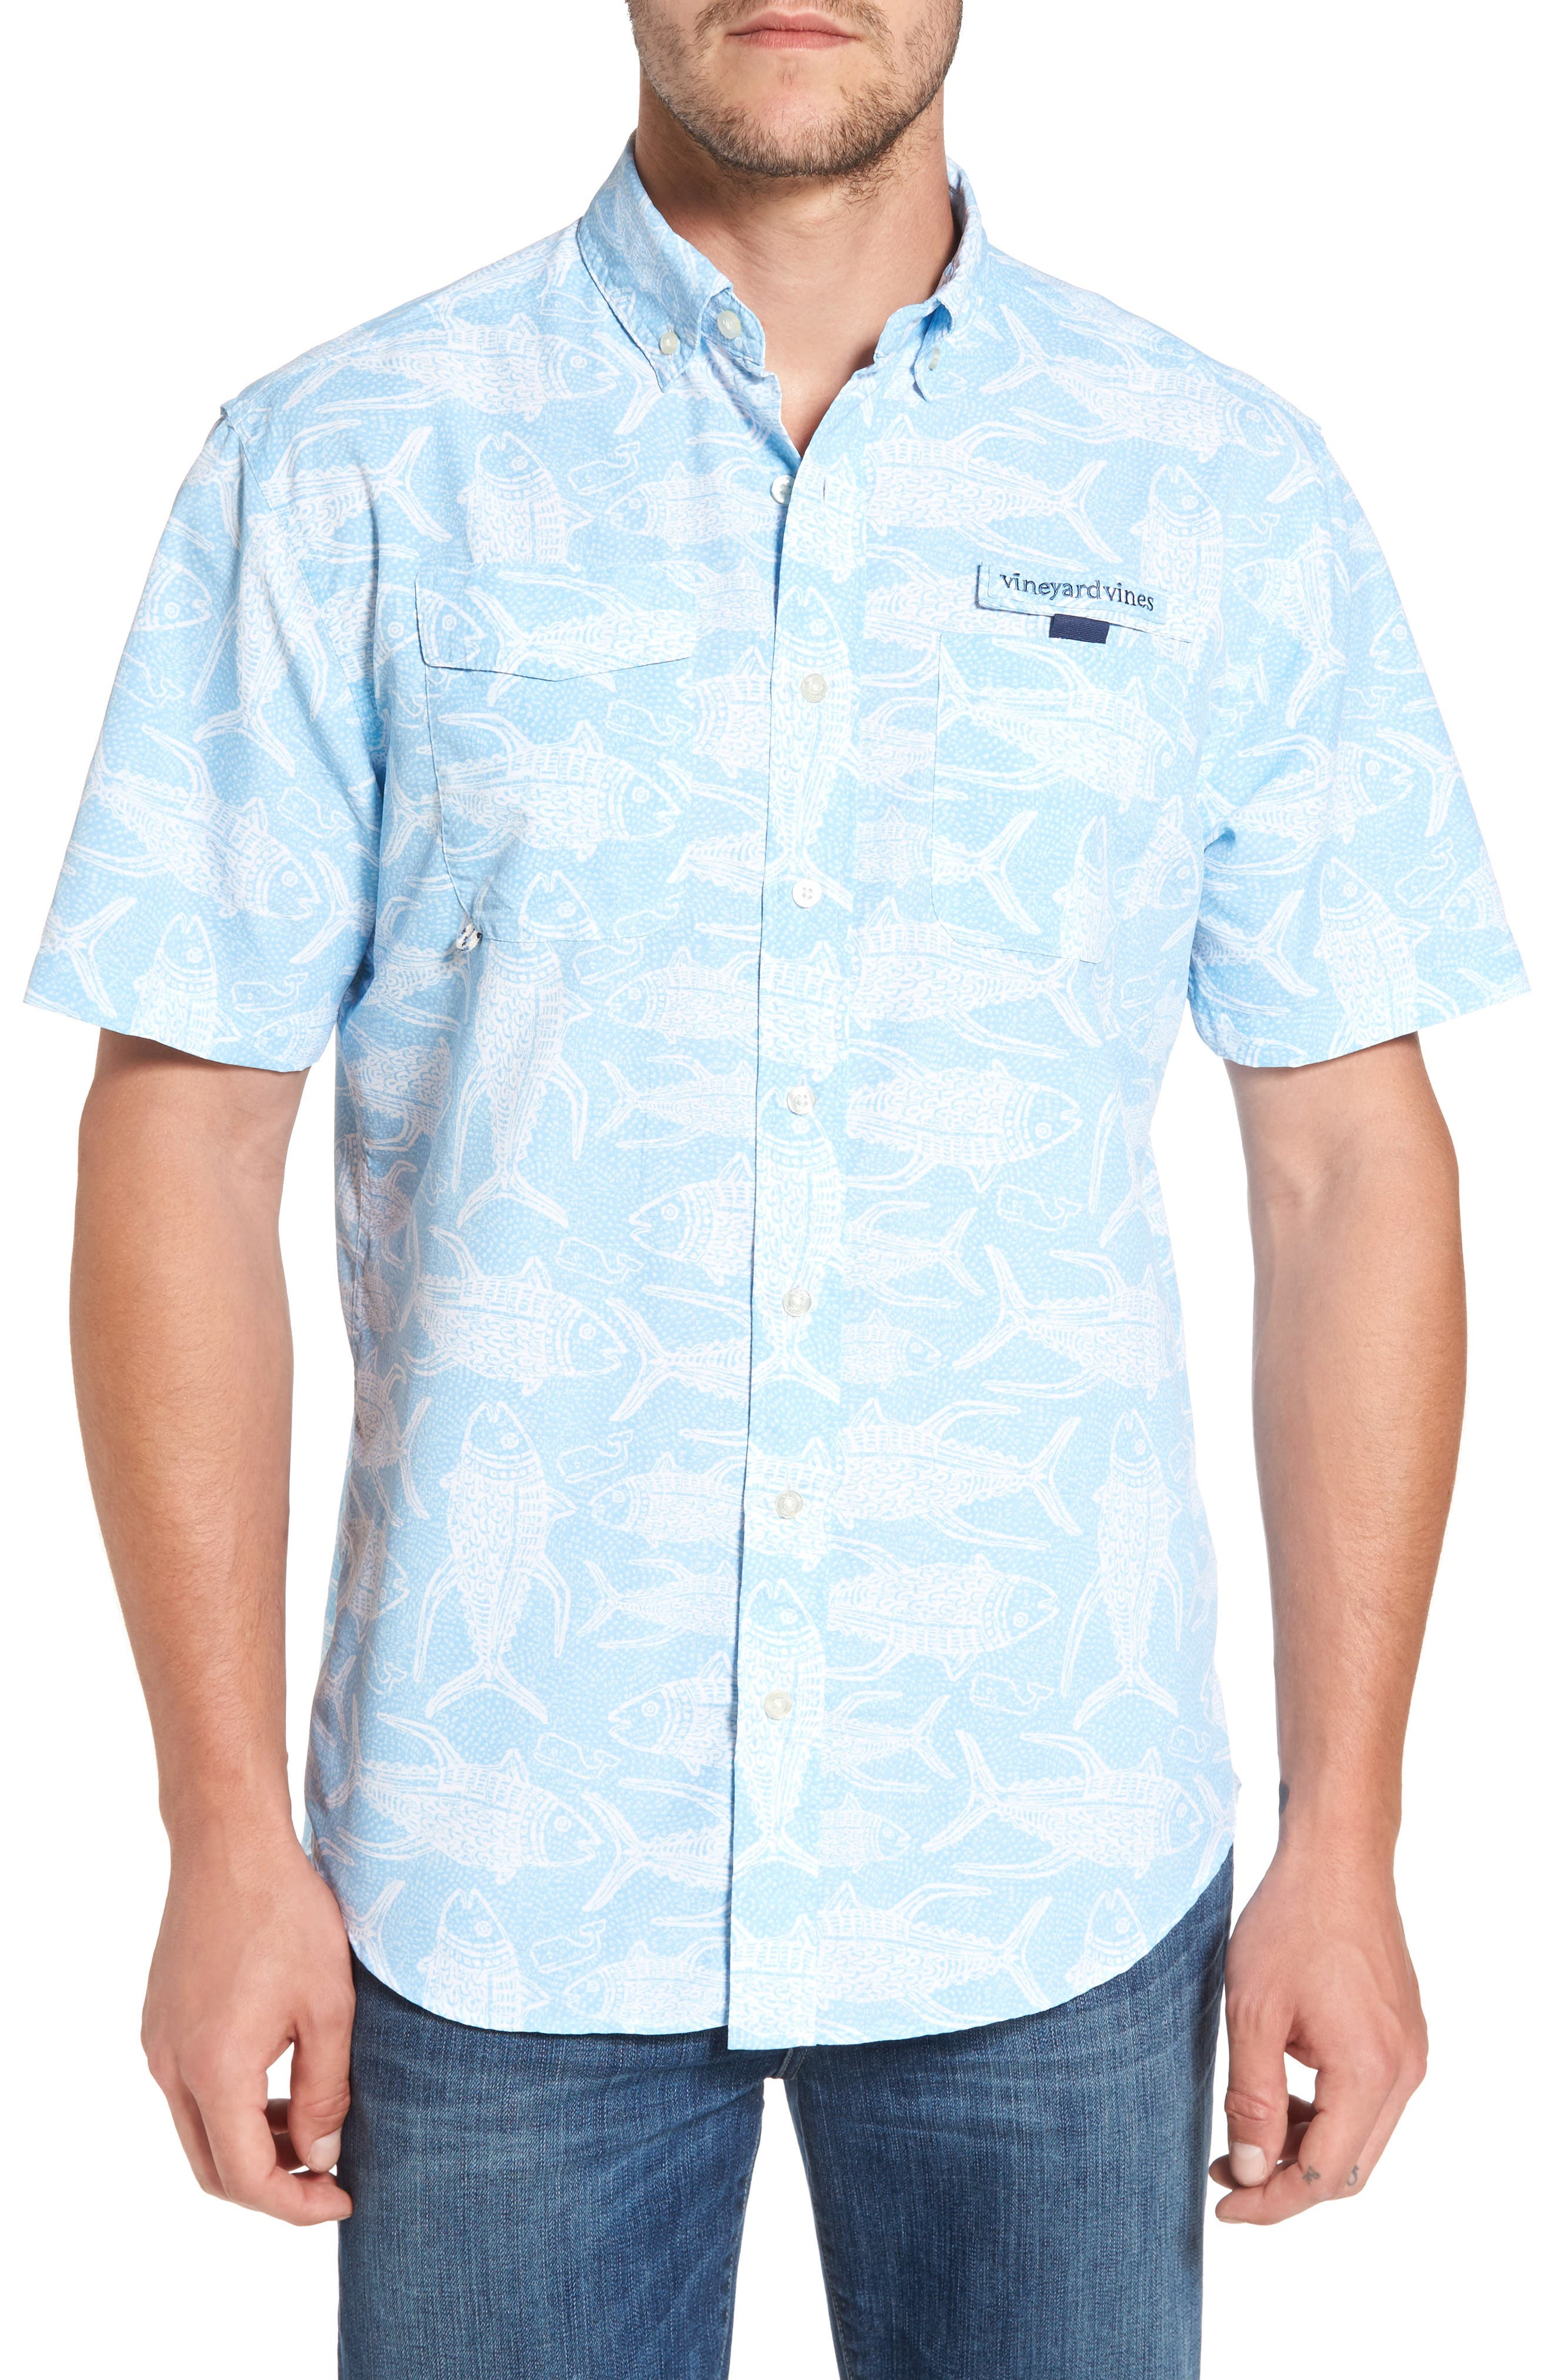 VINEYARD VINES,                             Tuna Batic Harbor Short Sleeve Sport Shirt,                             Main thumbnail 1, color,                             456